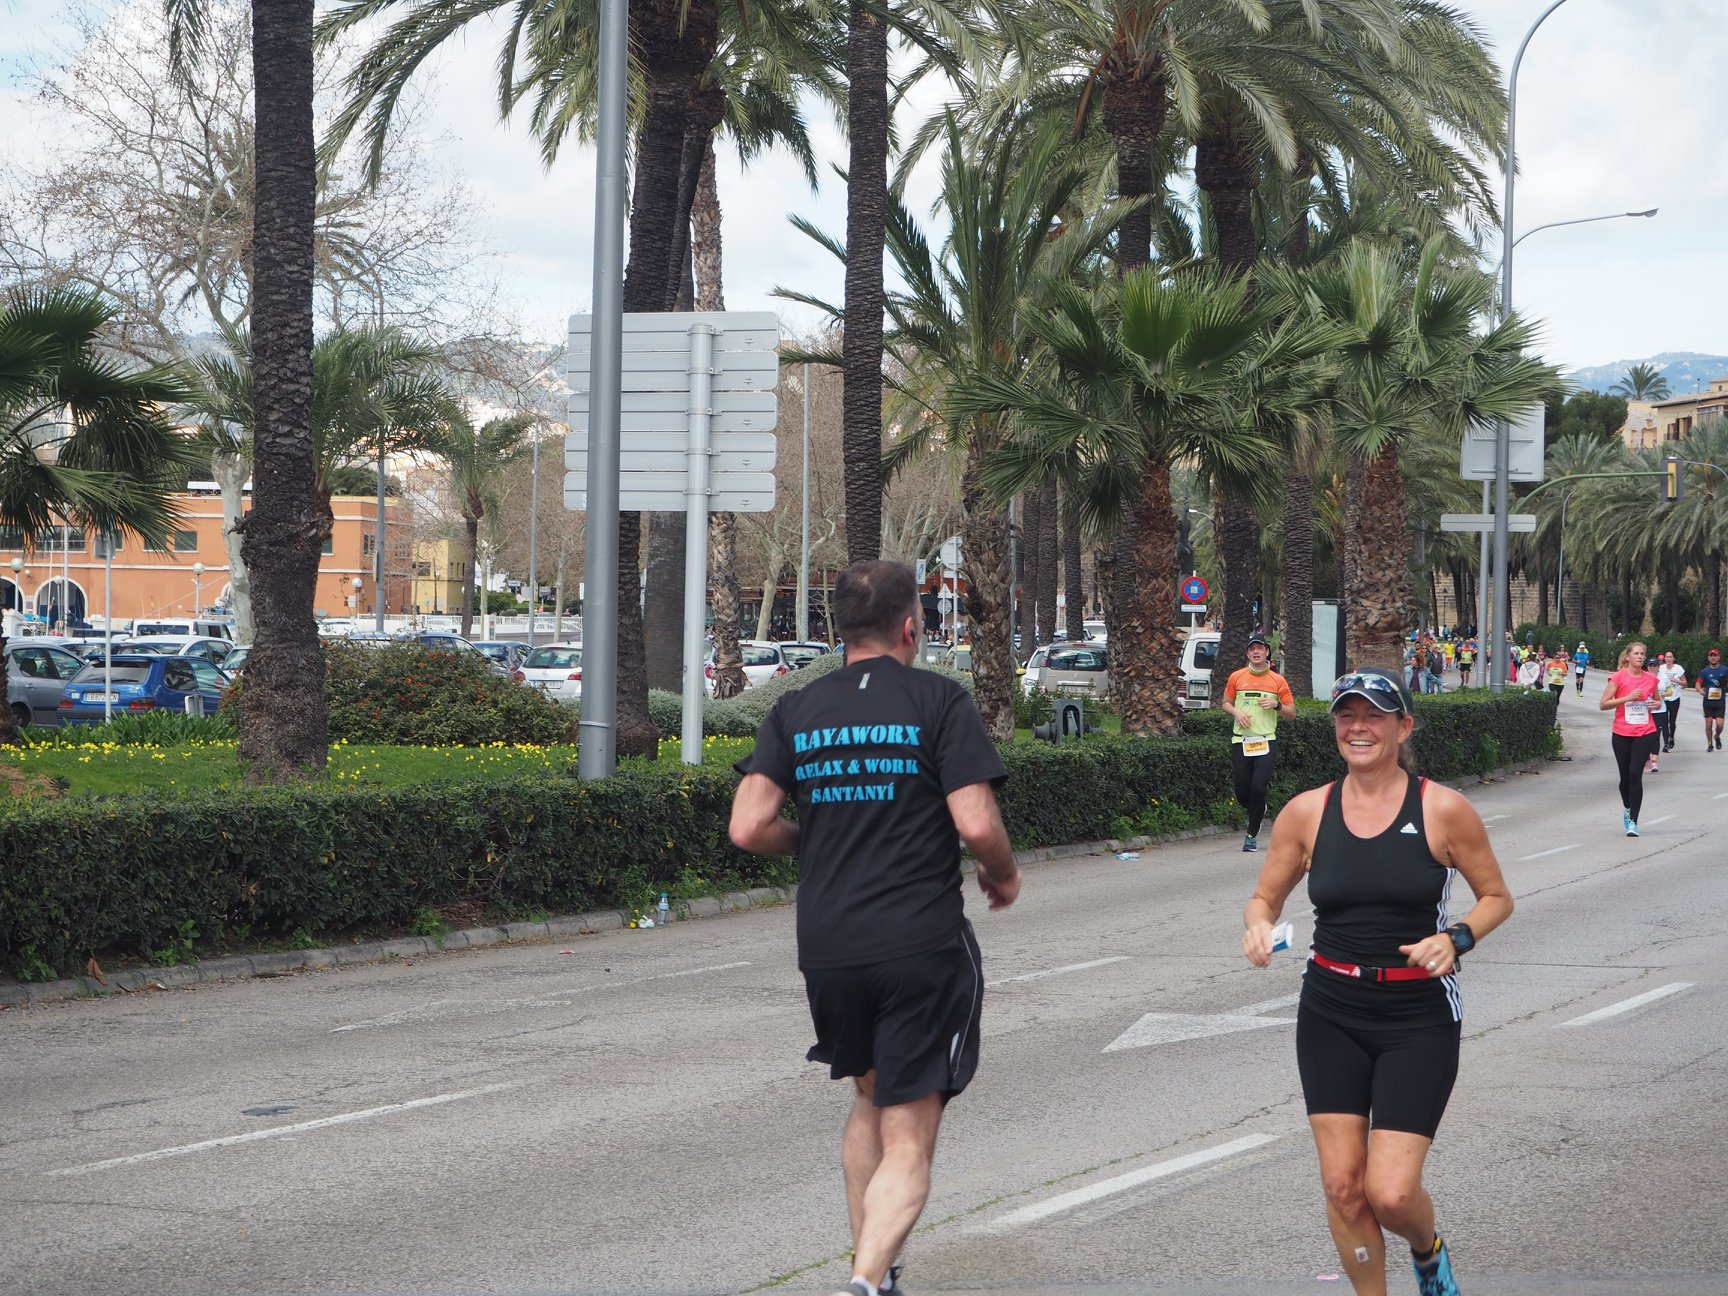 Half Marathon Palma de Mallorca: Team Rayaworx with fun